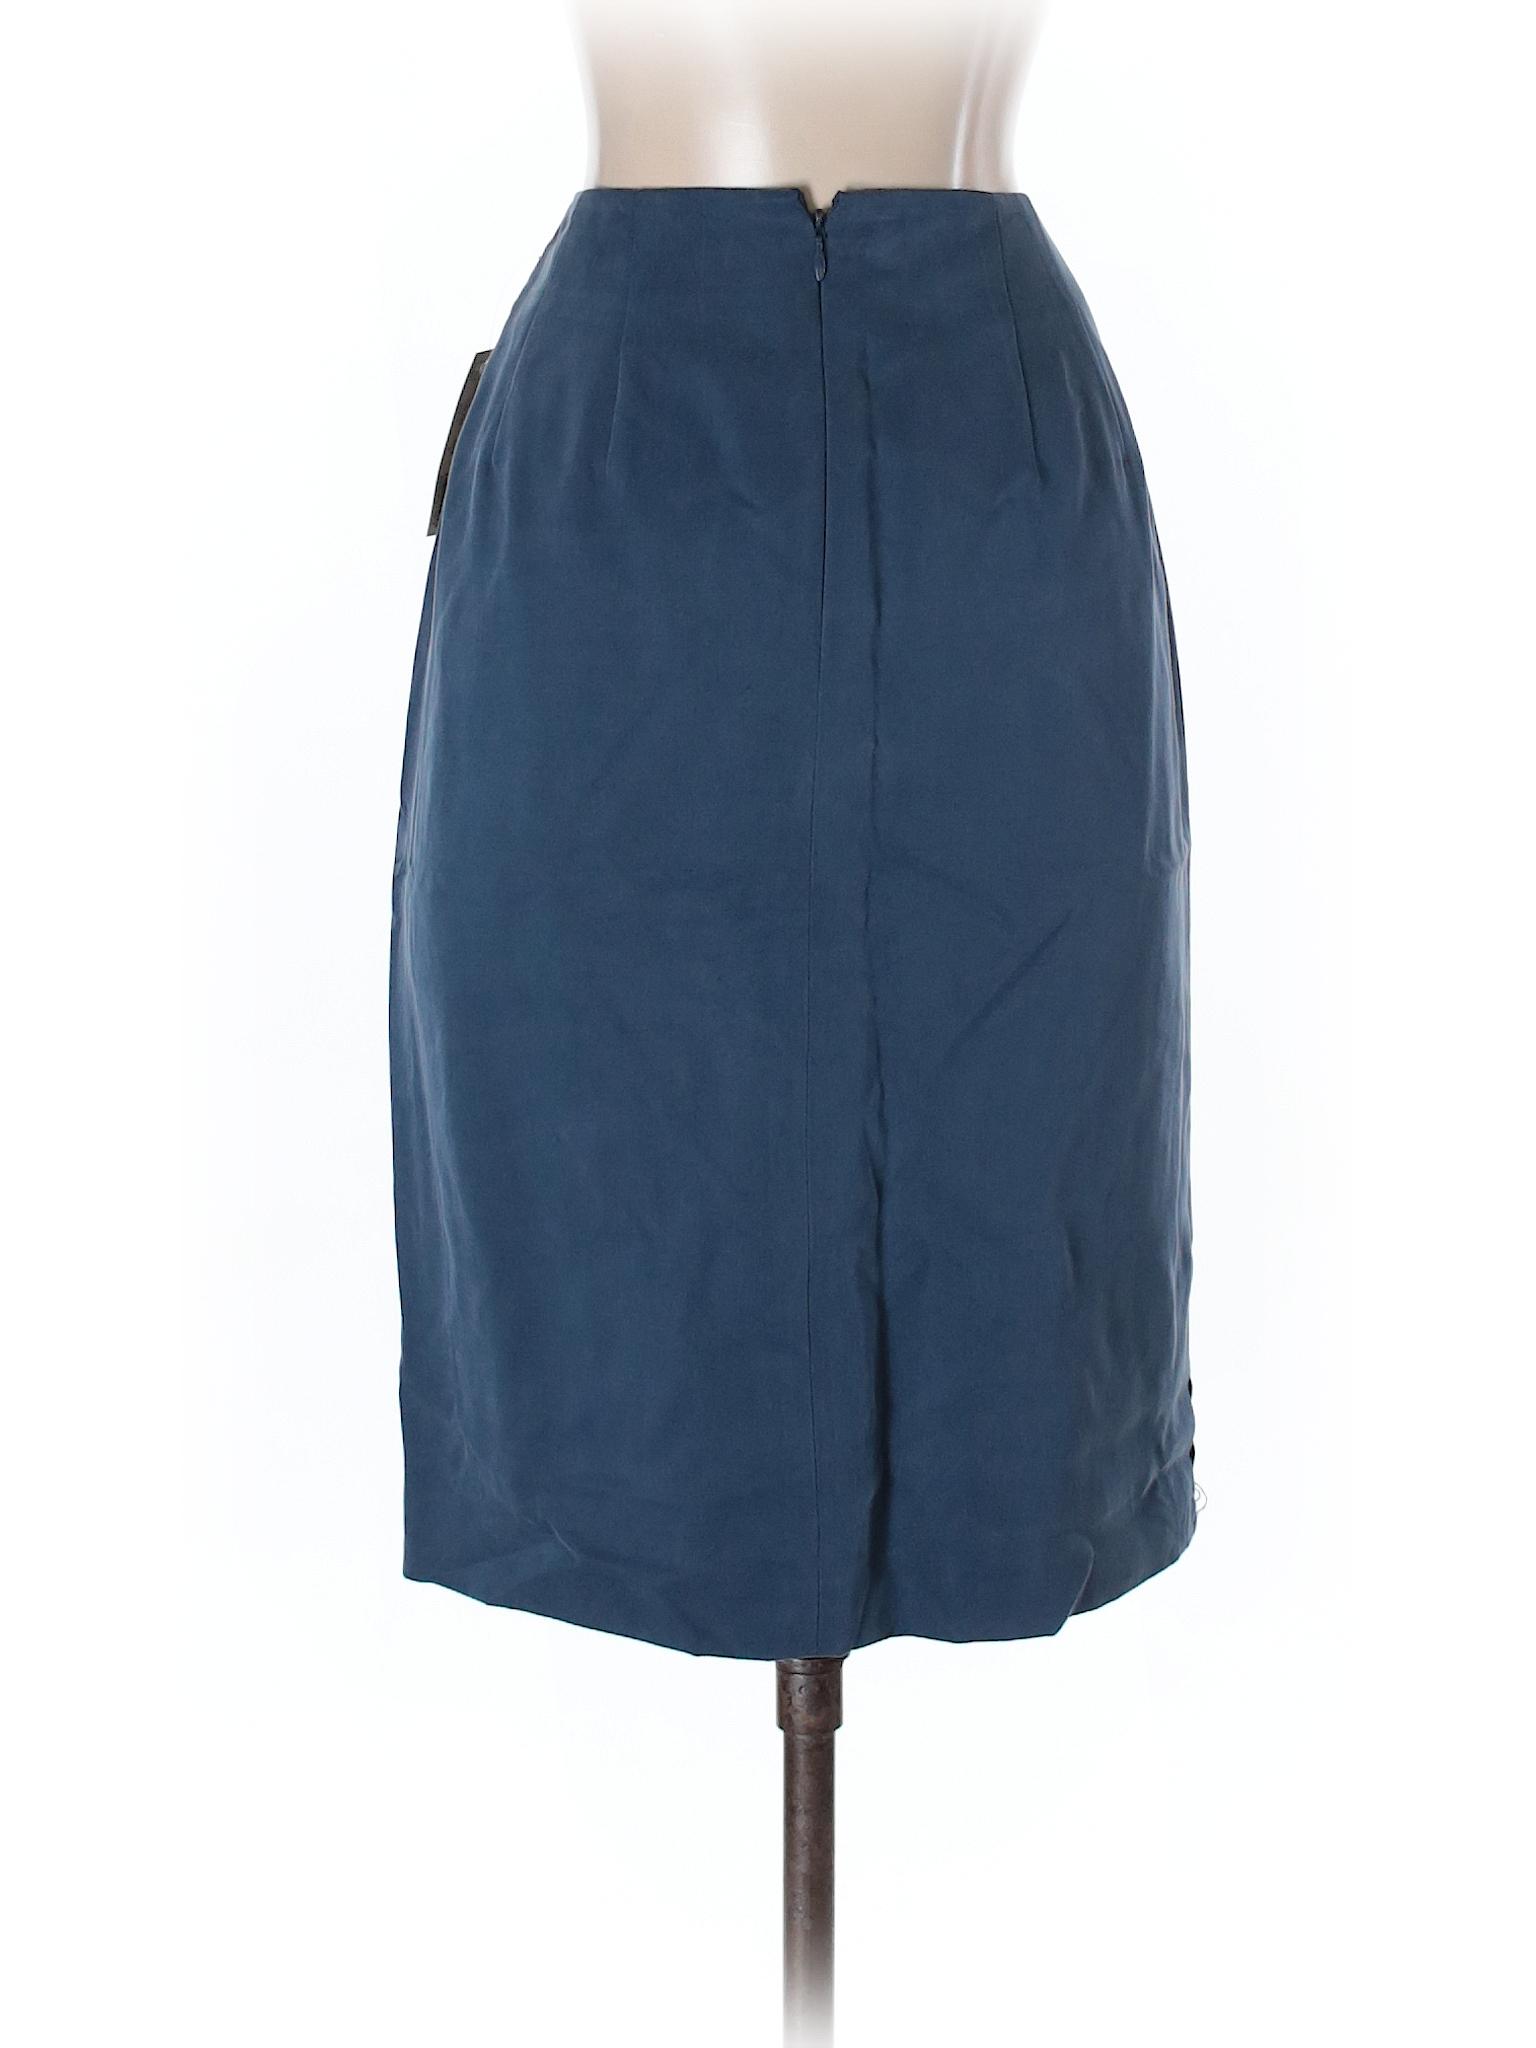 Smith Amanda Leisure Winter Skirt Casual wU6zE